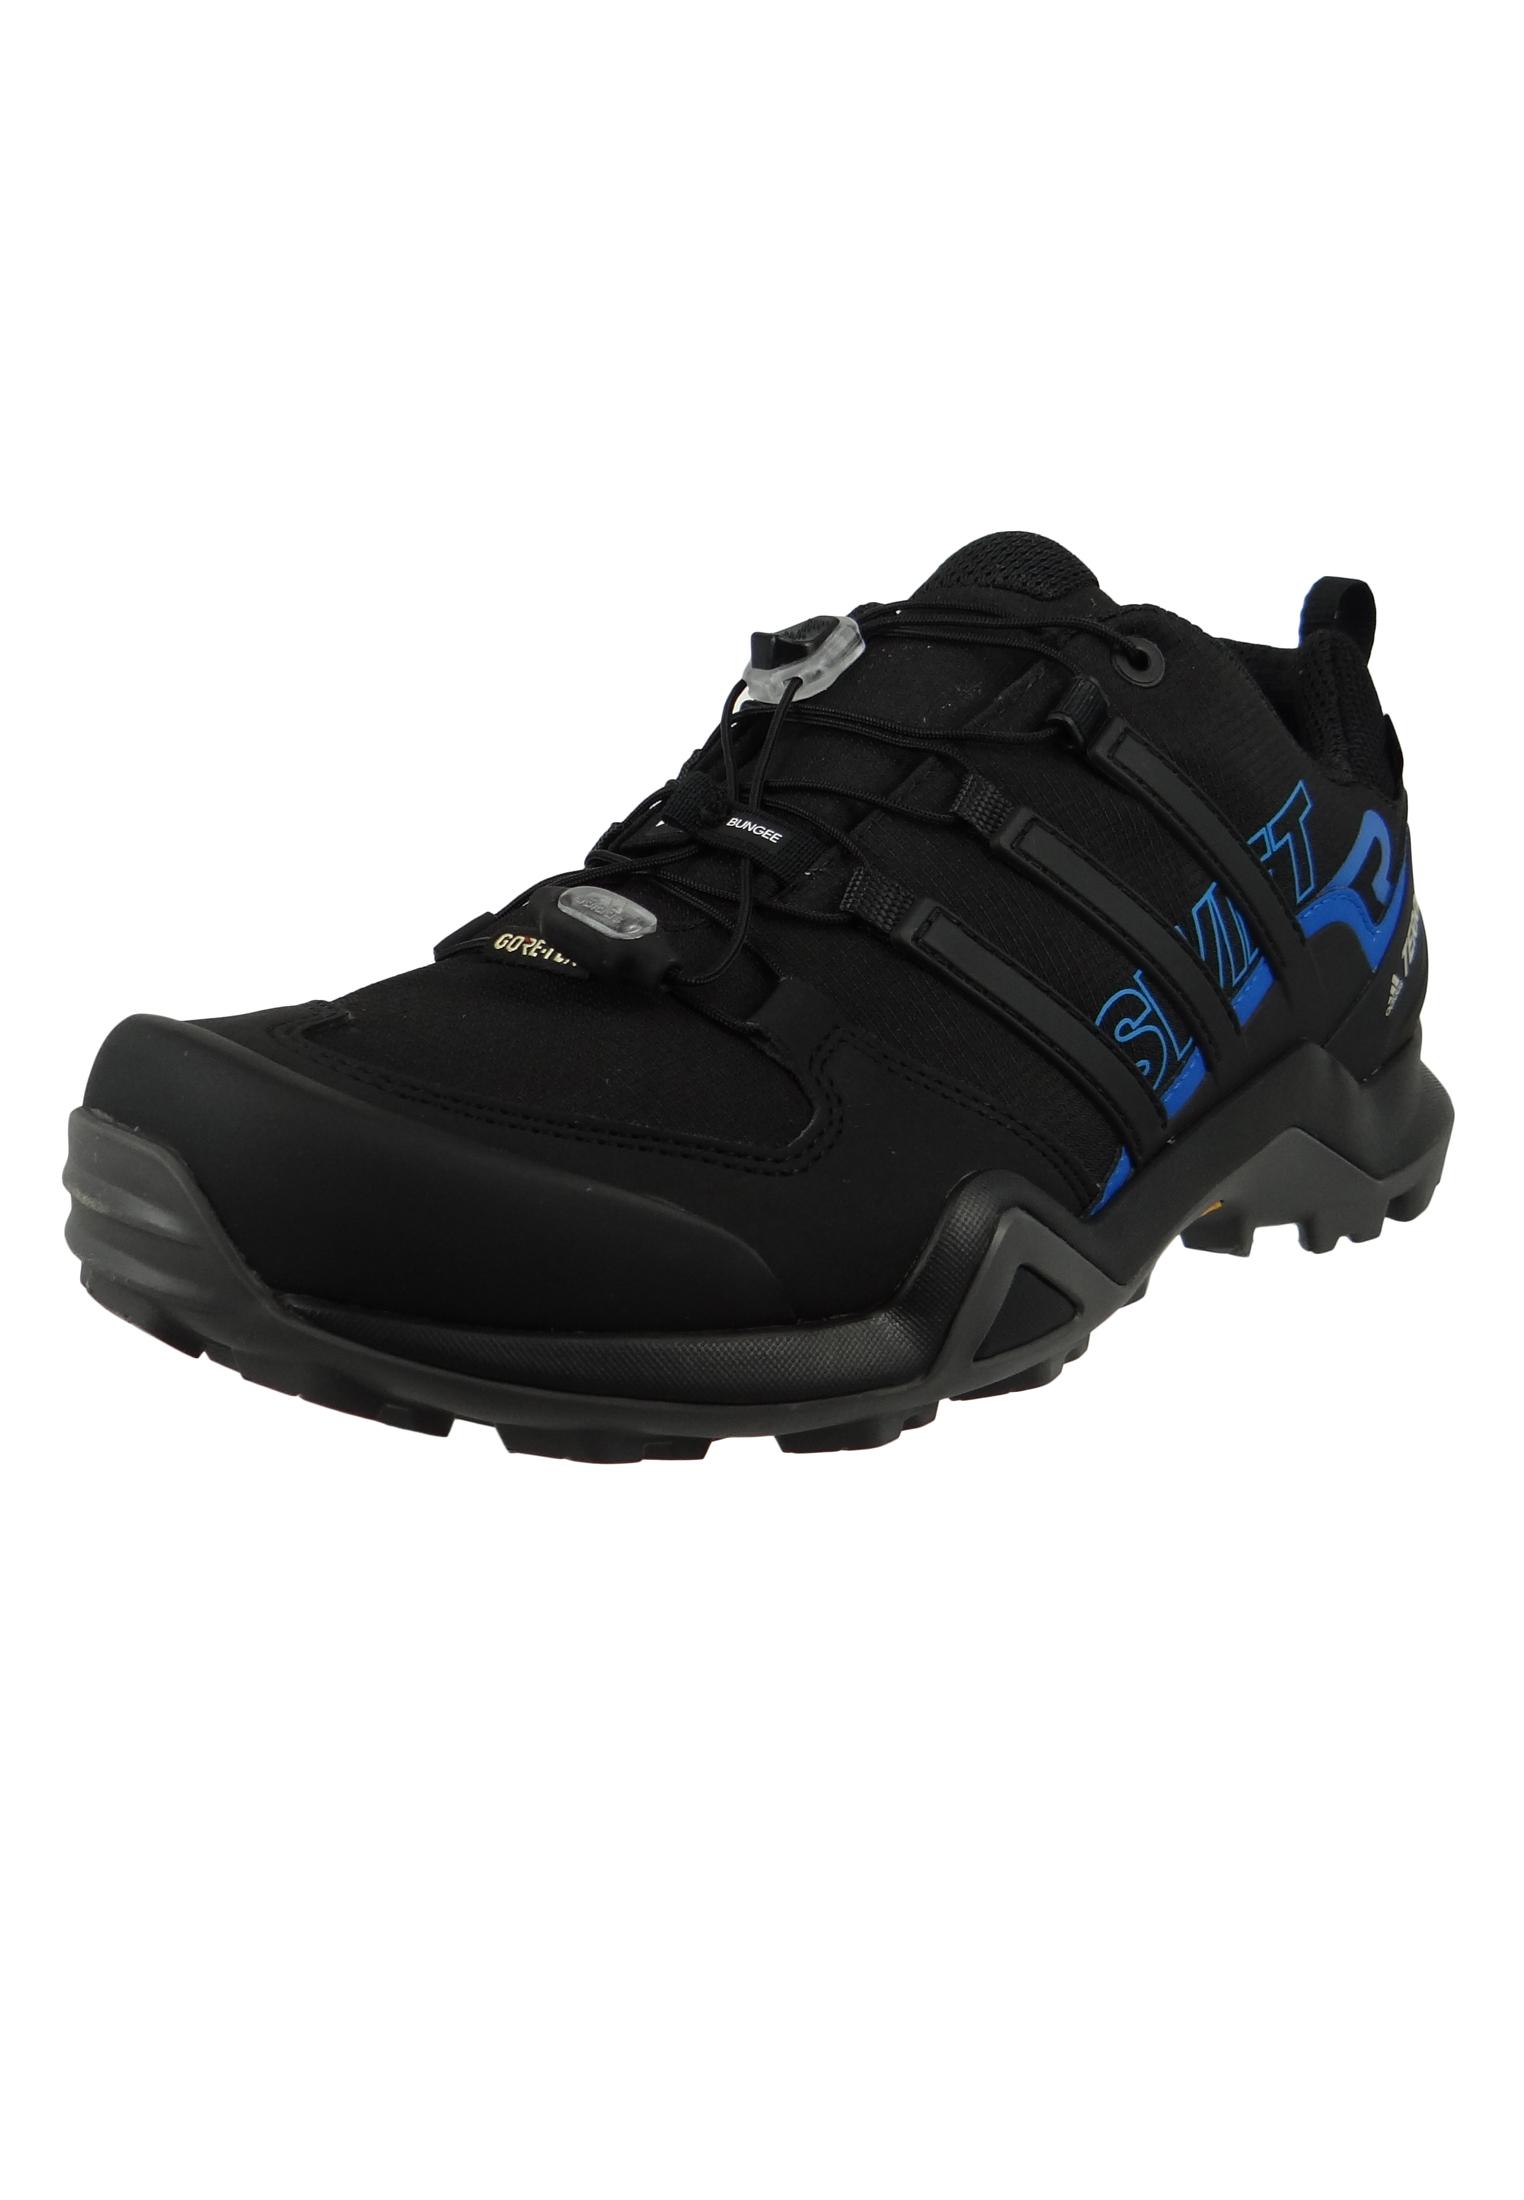 adidas TERREX SWIFT R2 GTX AC7829 Herren Outdoor Hikingschuhe core blackcore blackbright blue Schwarz